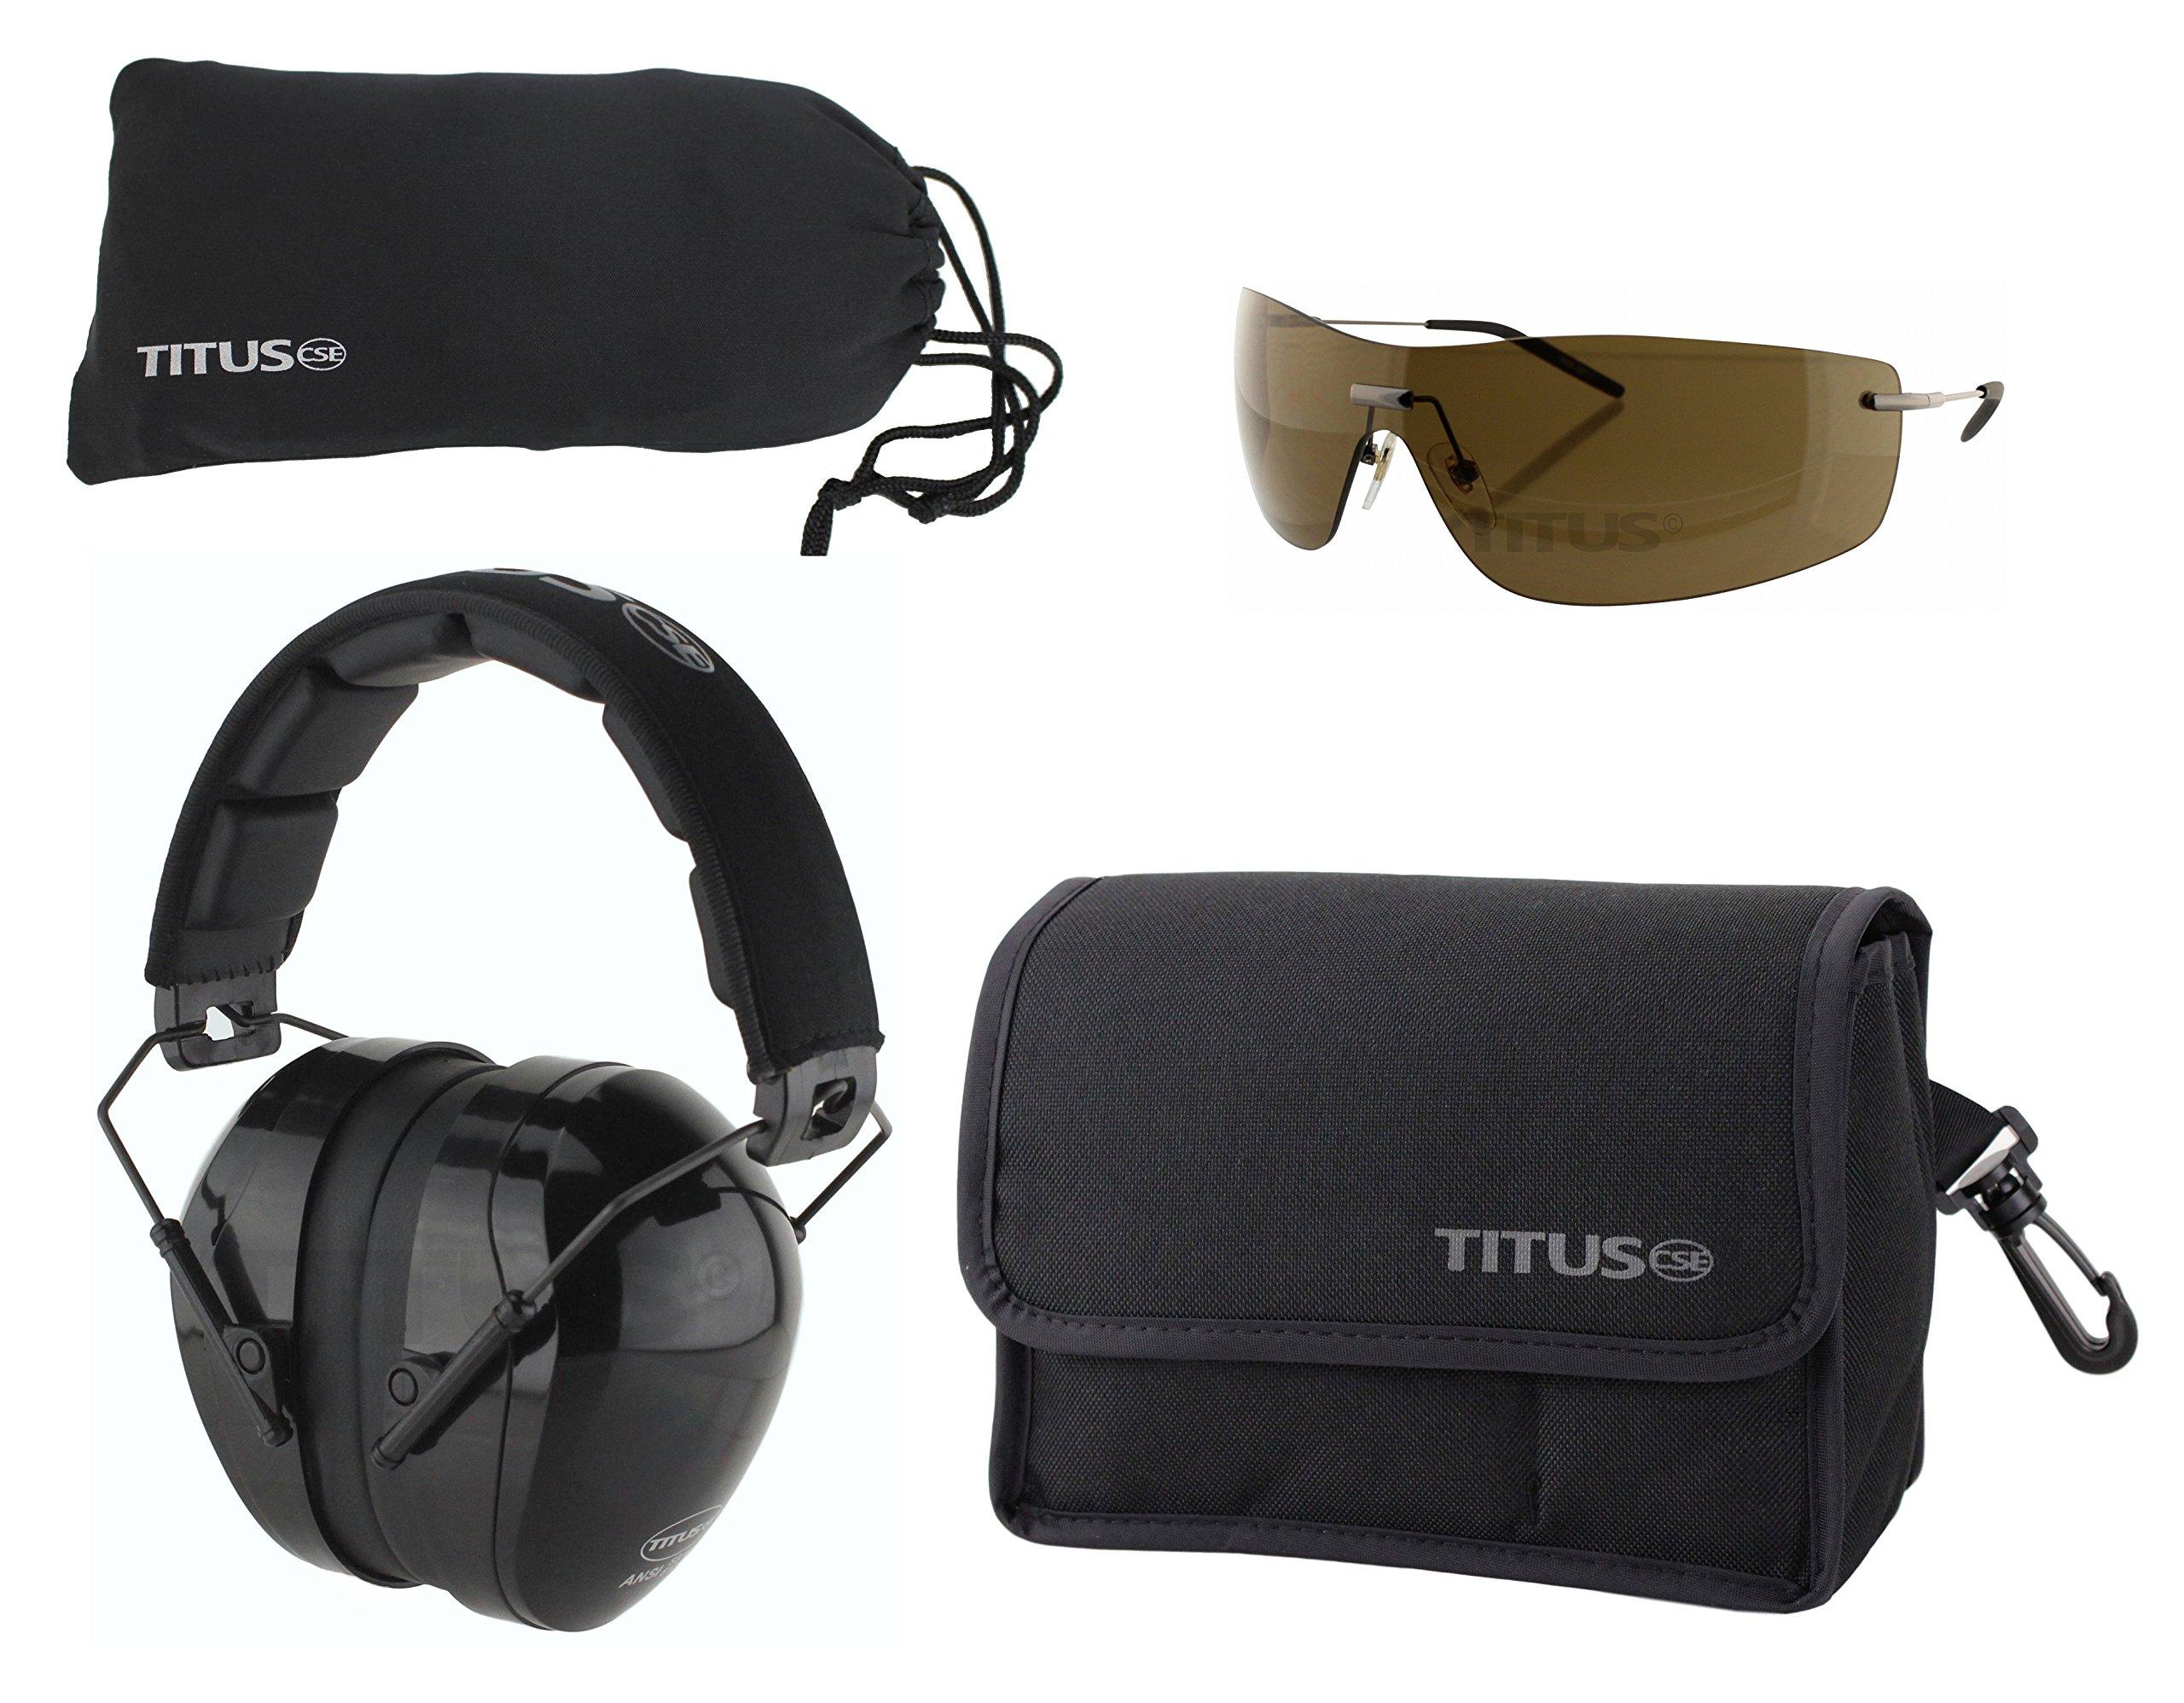 TITUS Safety Earmuffs & Glasses Combo (Black - Contoured, G16 Bronze w/Euro-style Metal Frame)